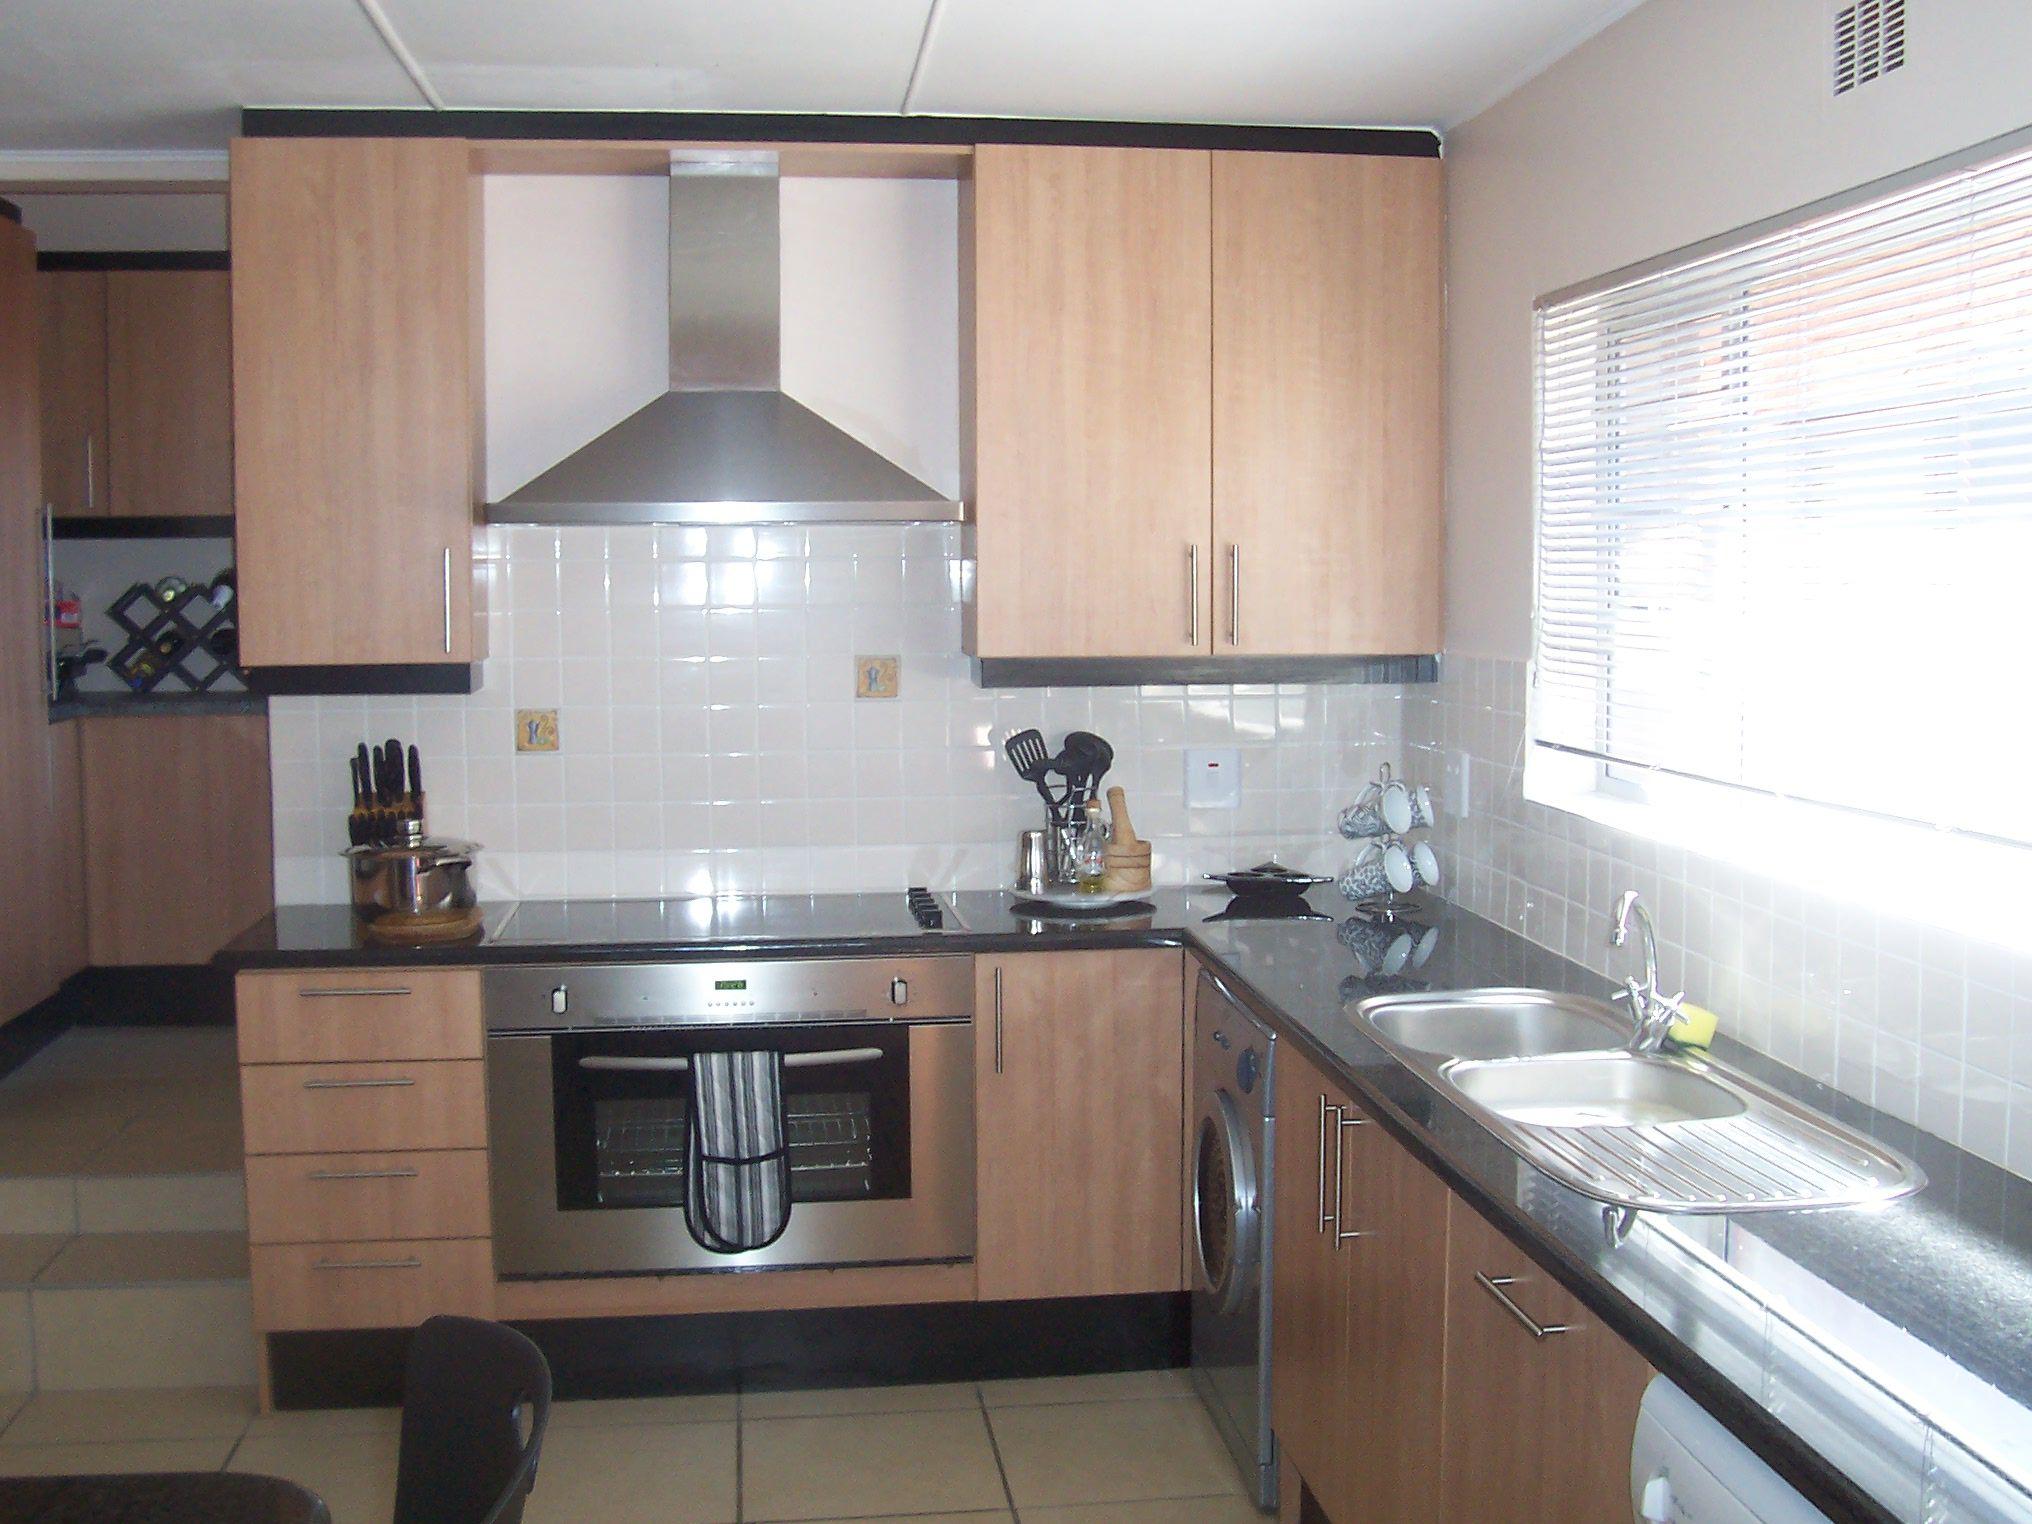 Interior Cupboards Kitchen kitchen cupboards home decor and design ideas pinterest cupboards